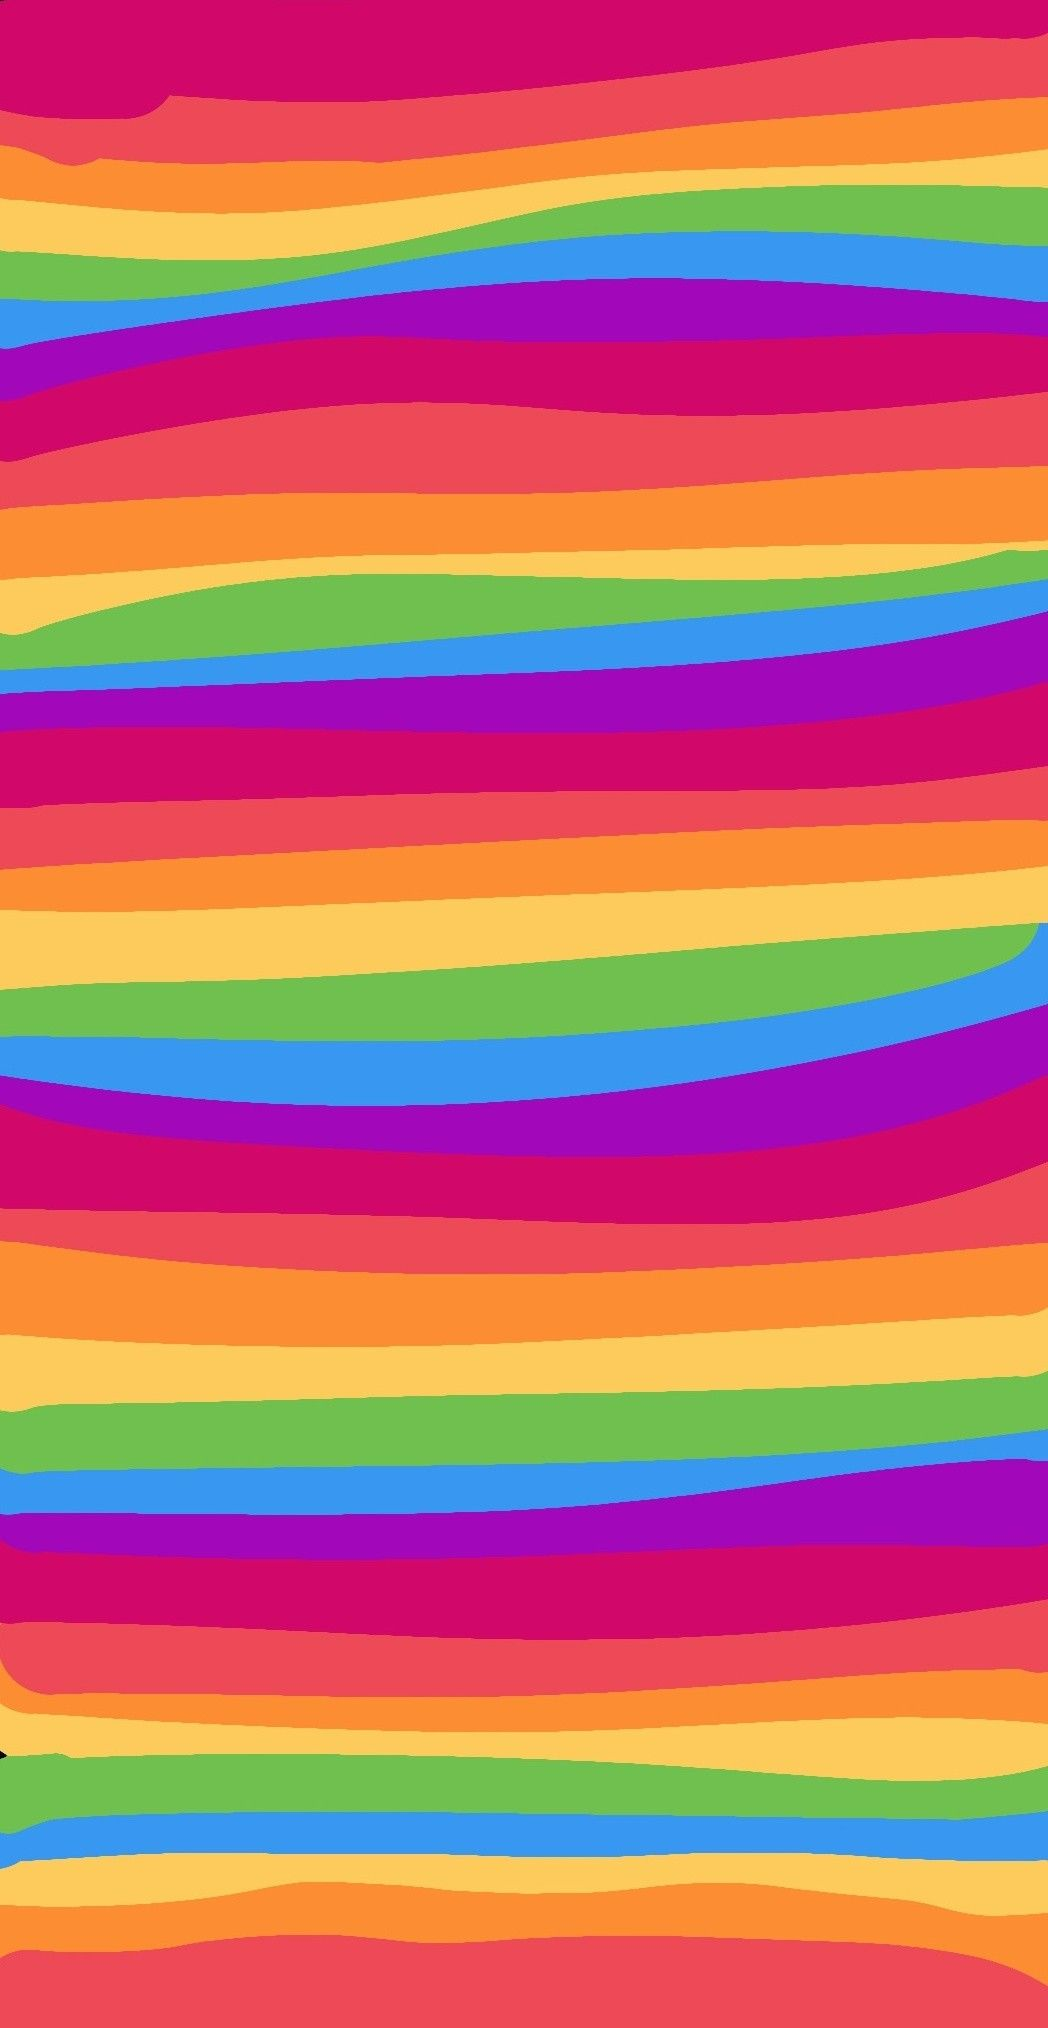 Pride Month Wallpaper Rainbow Print Rainbow Wallpaper Rainbow Pattern Aesthetic pride month rainbow wallpaper